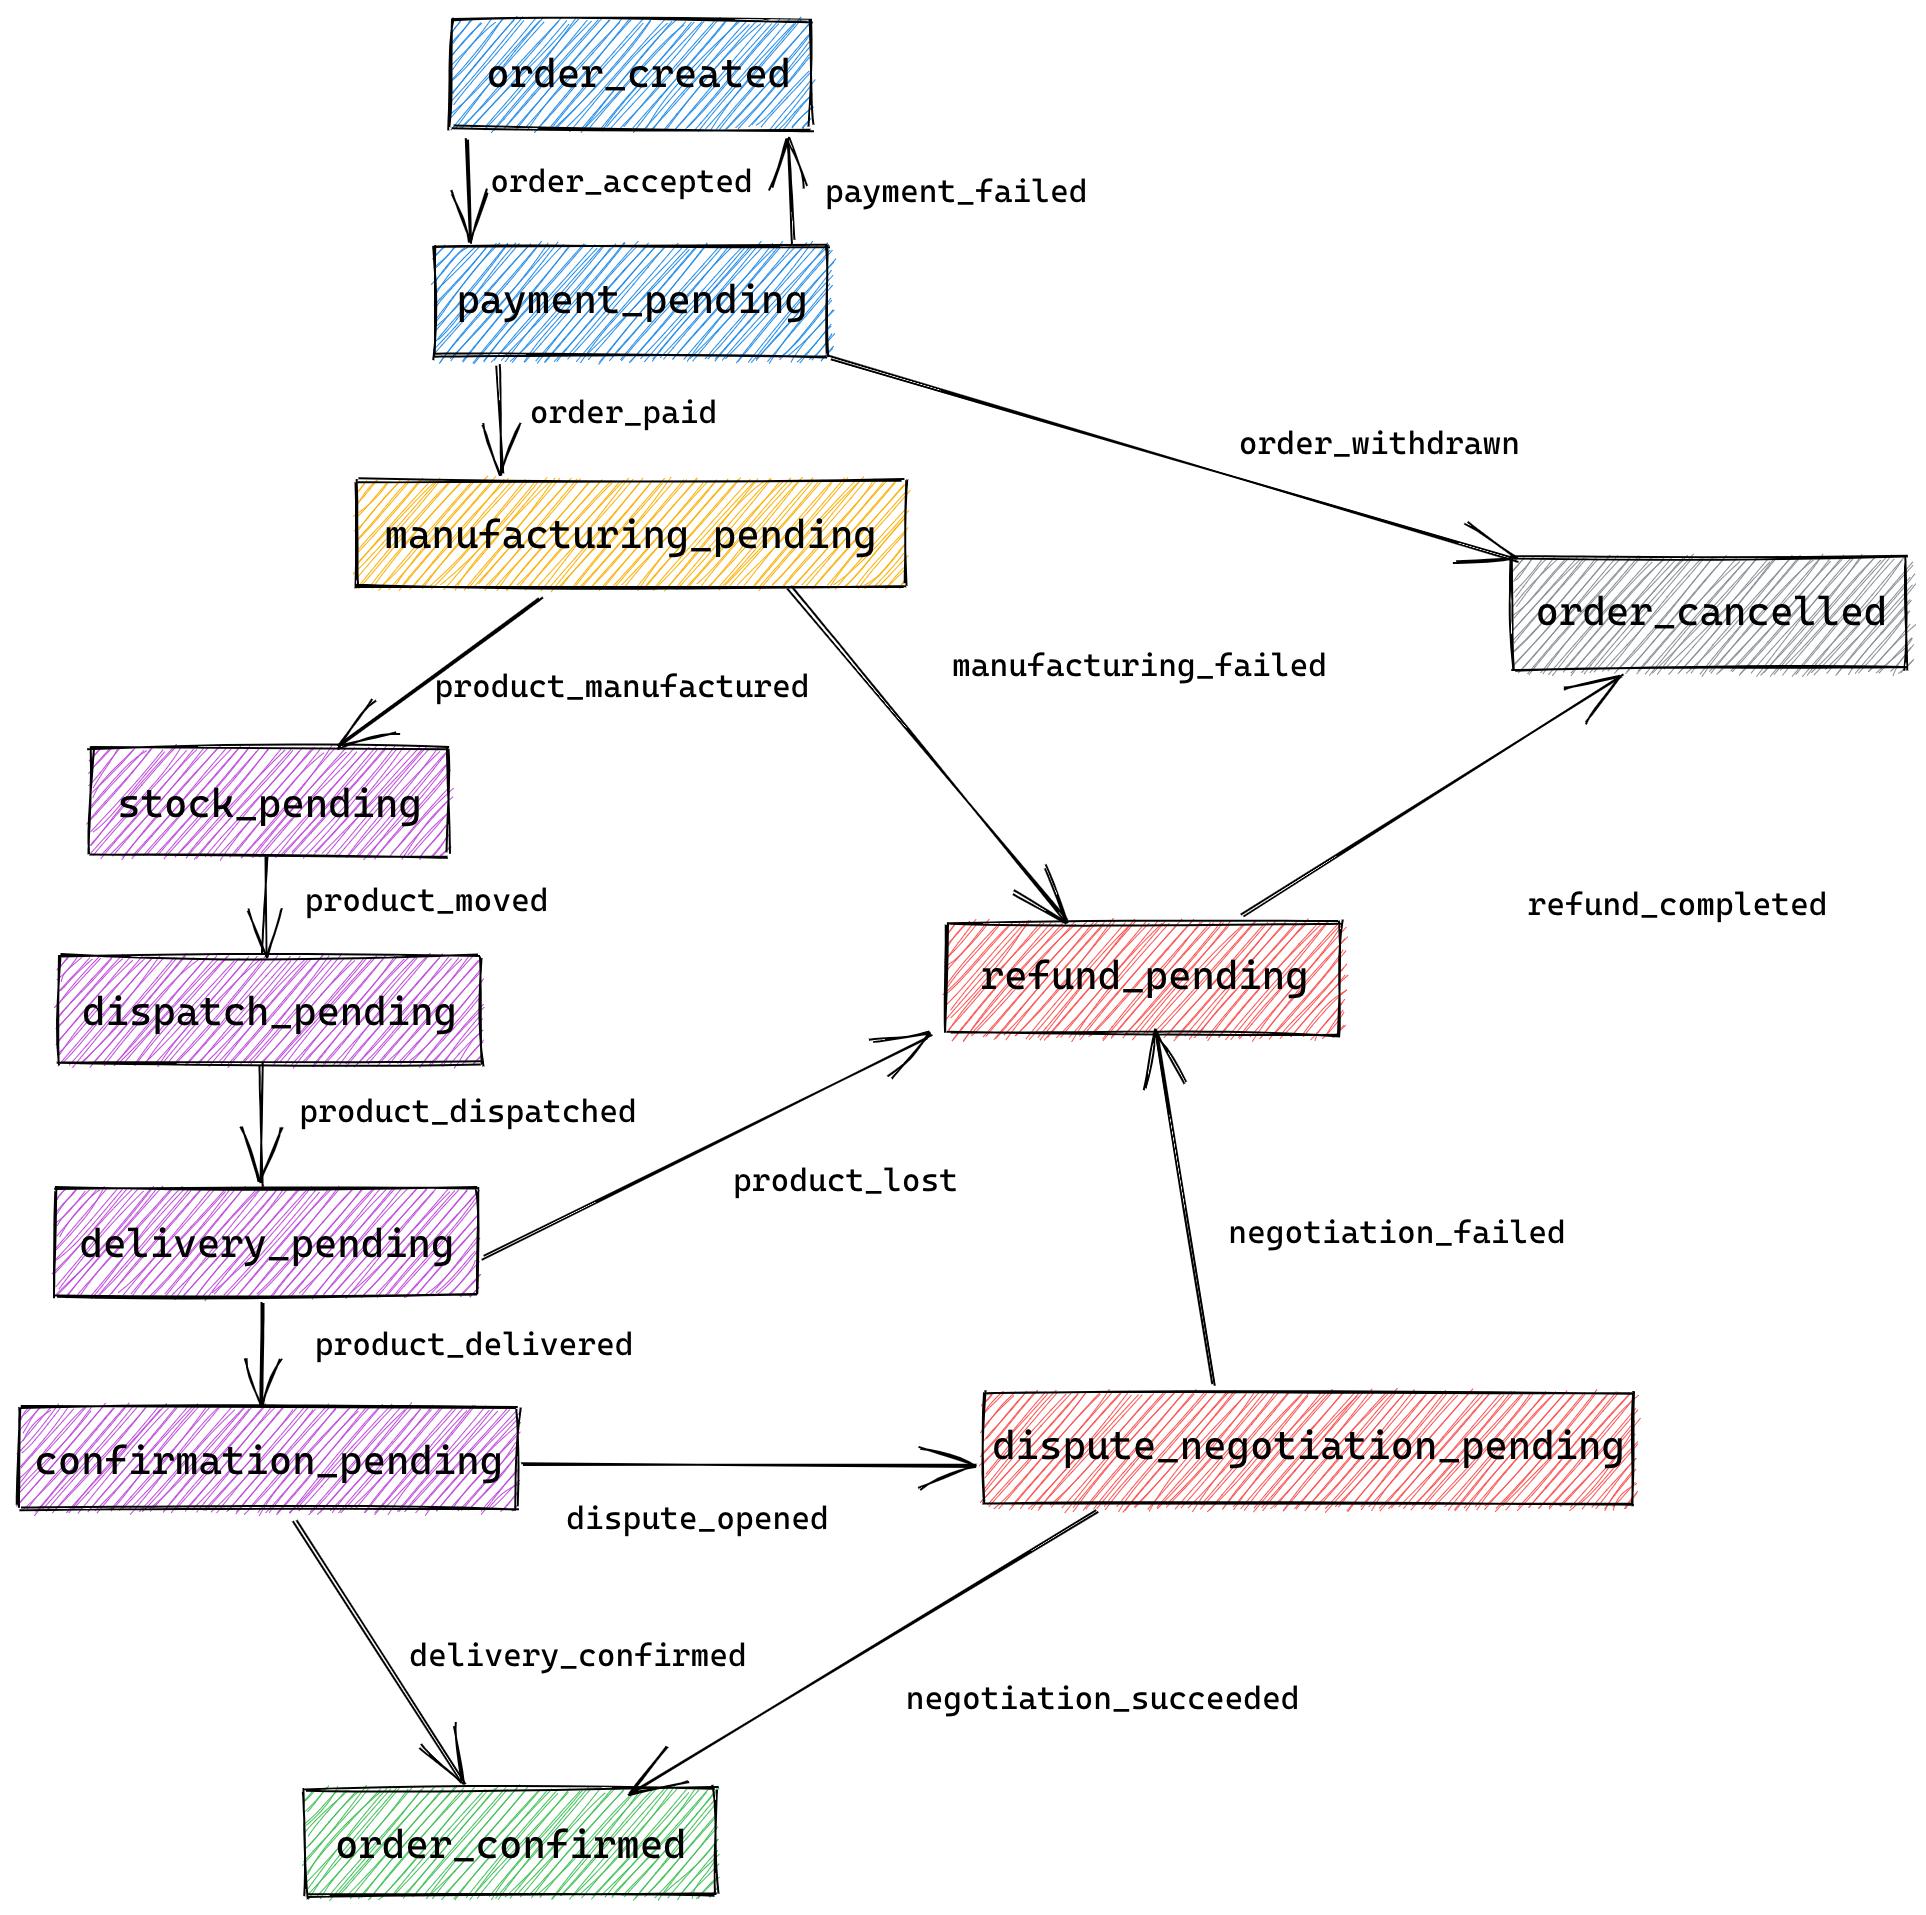 Full State Diagram